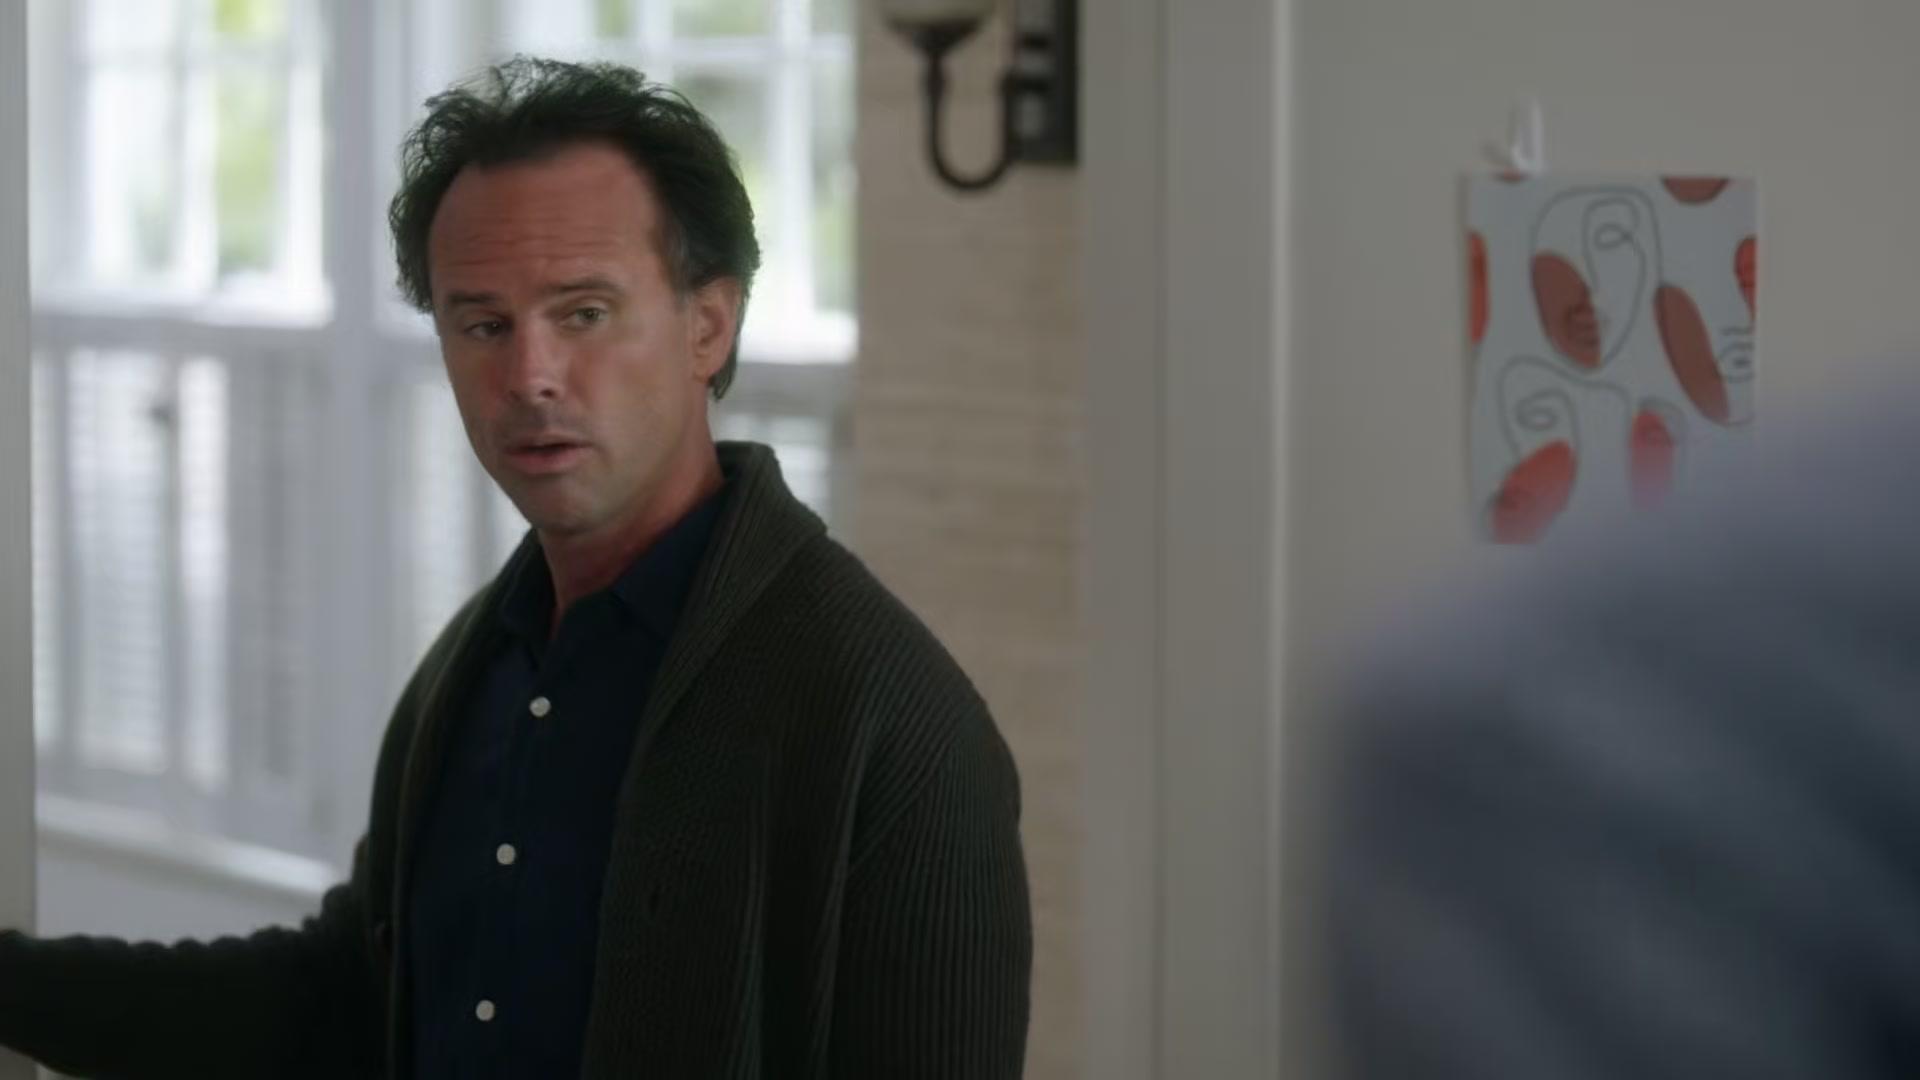 The Unicorn S01E06